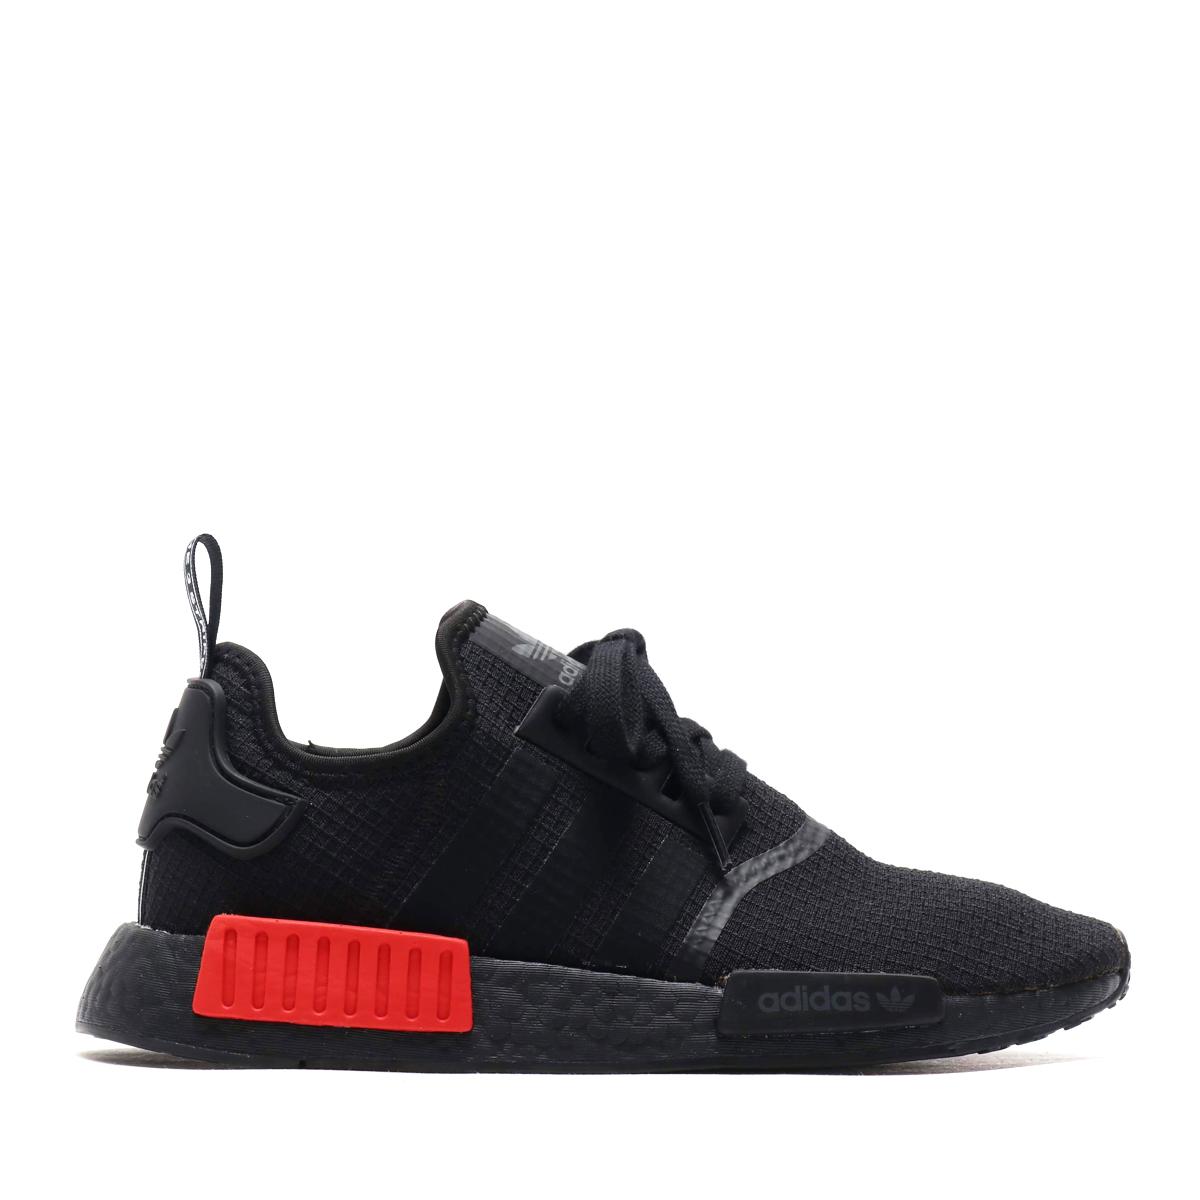 c45221a5e adidas NMD R1 (Adidas N M D R1) core black   core black   rush red 18FW-I